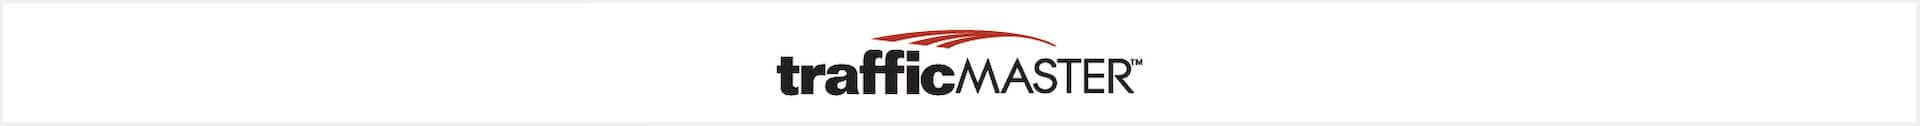 Traffic Master Brand Banner